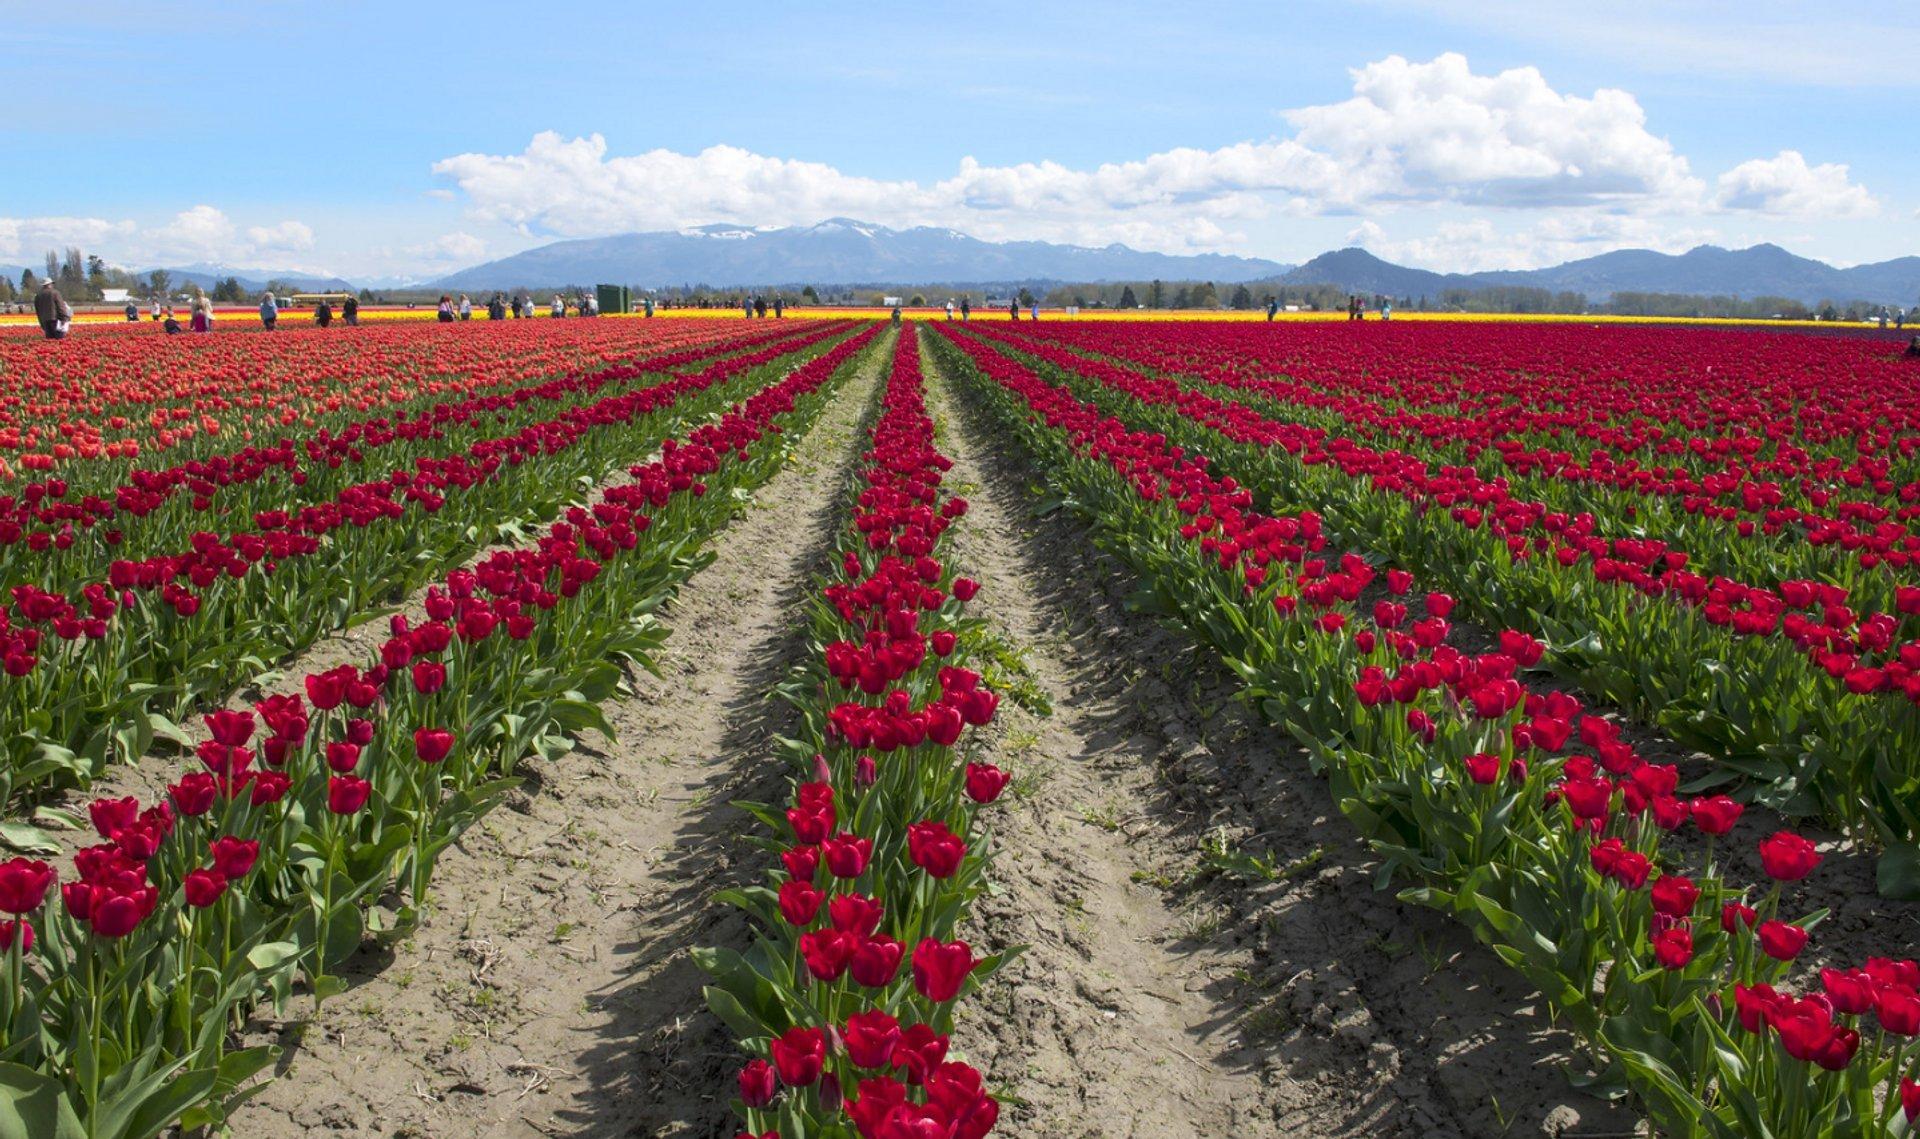 Skagit Valley Tulip Festival near Seattle, Washington in Seattle - Best Season 2020